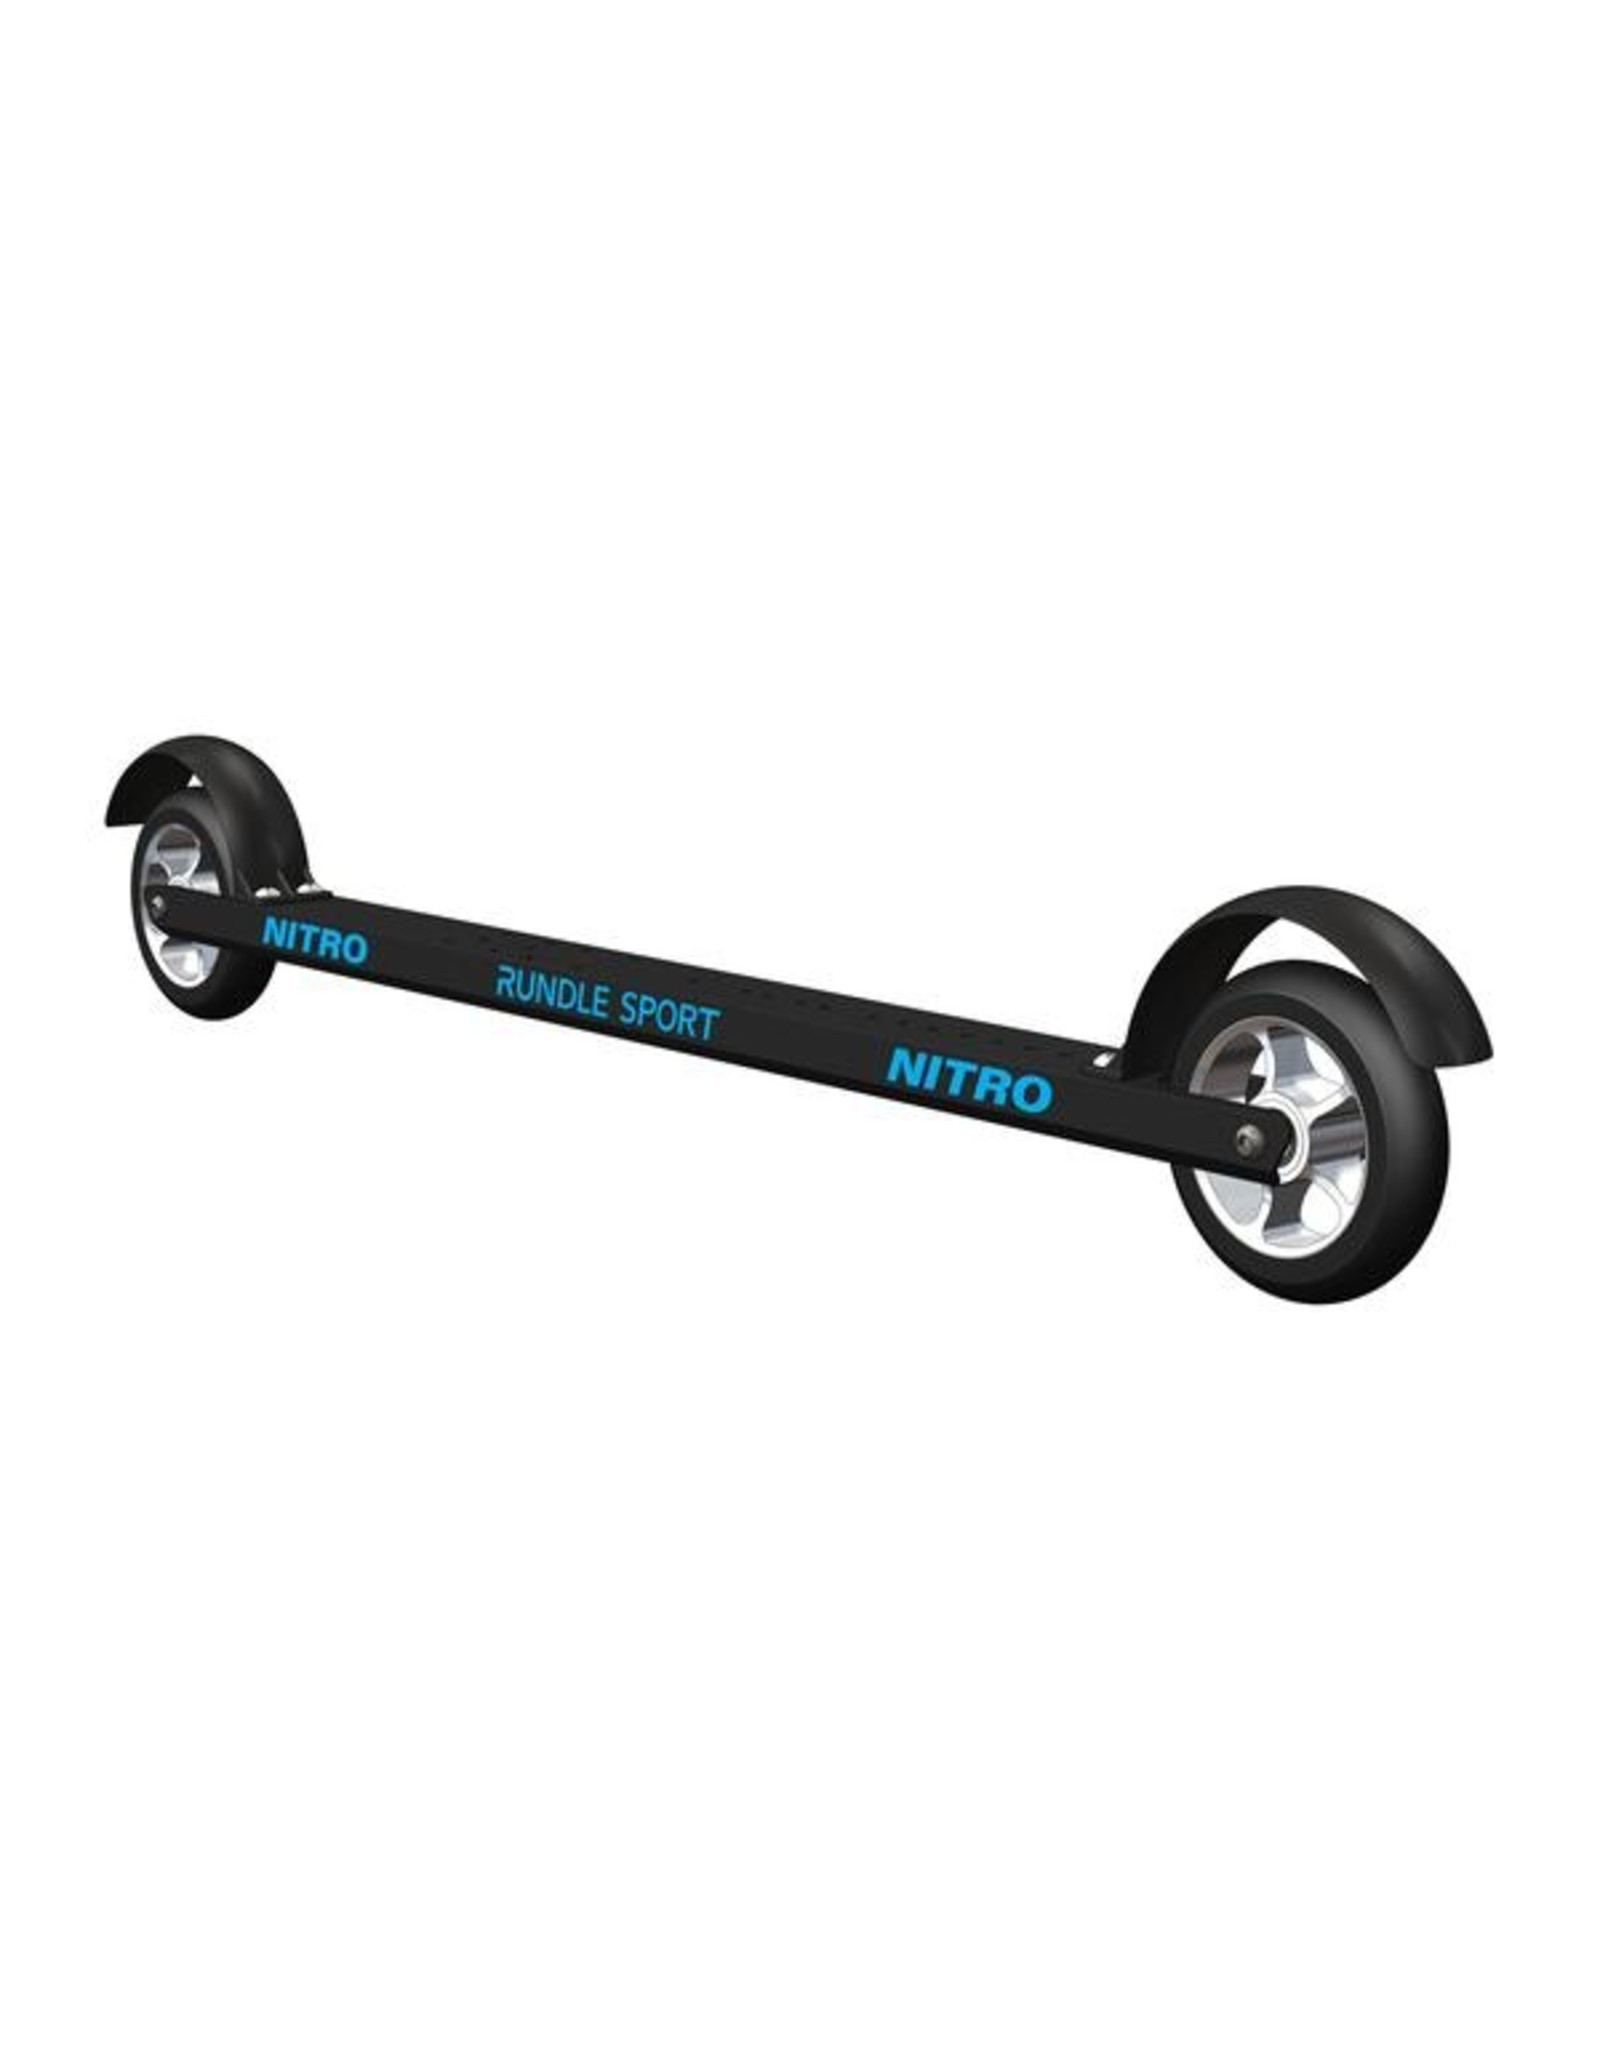 Rundle Sport Rundle Sport, Nitro Skate Rollerski